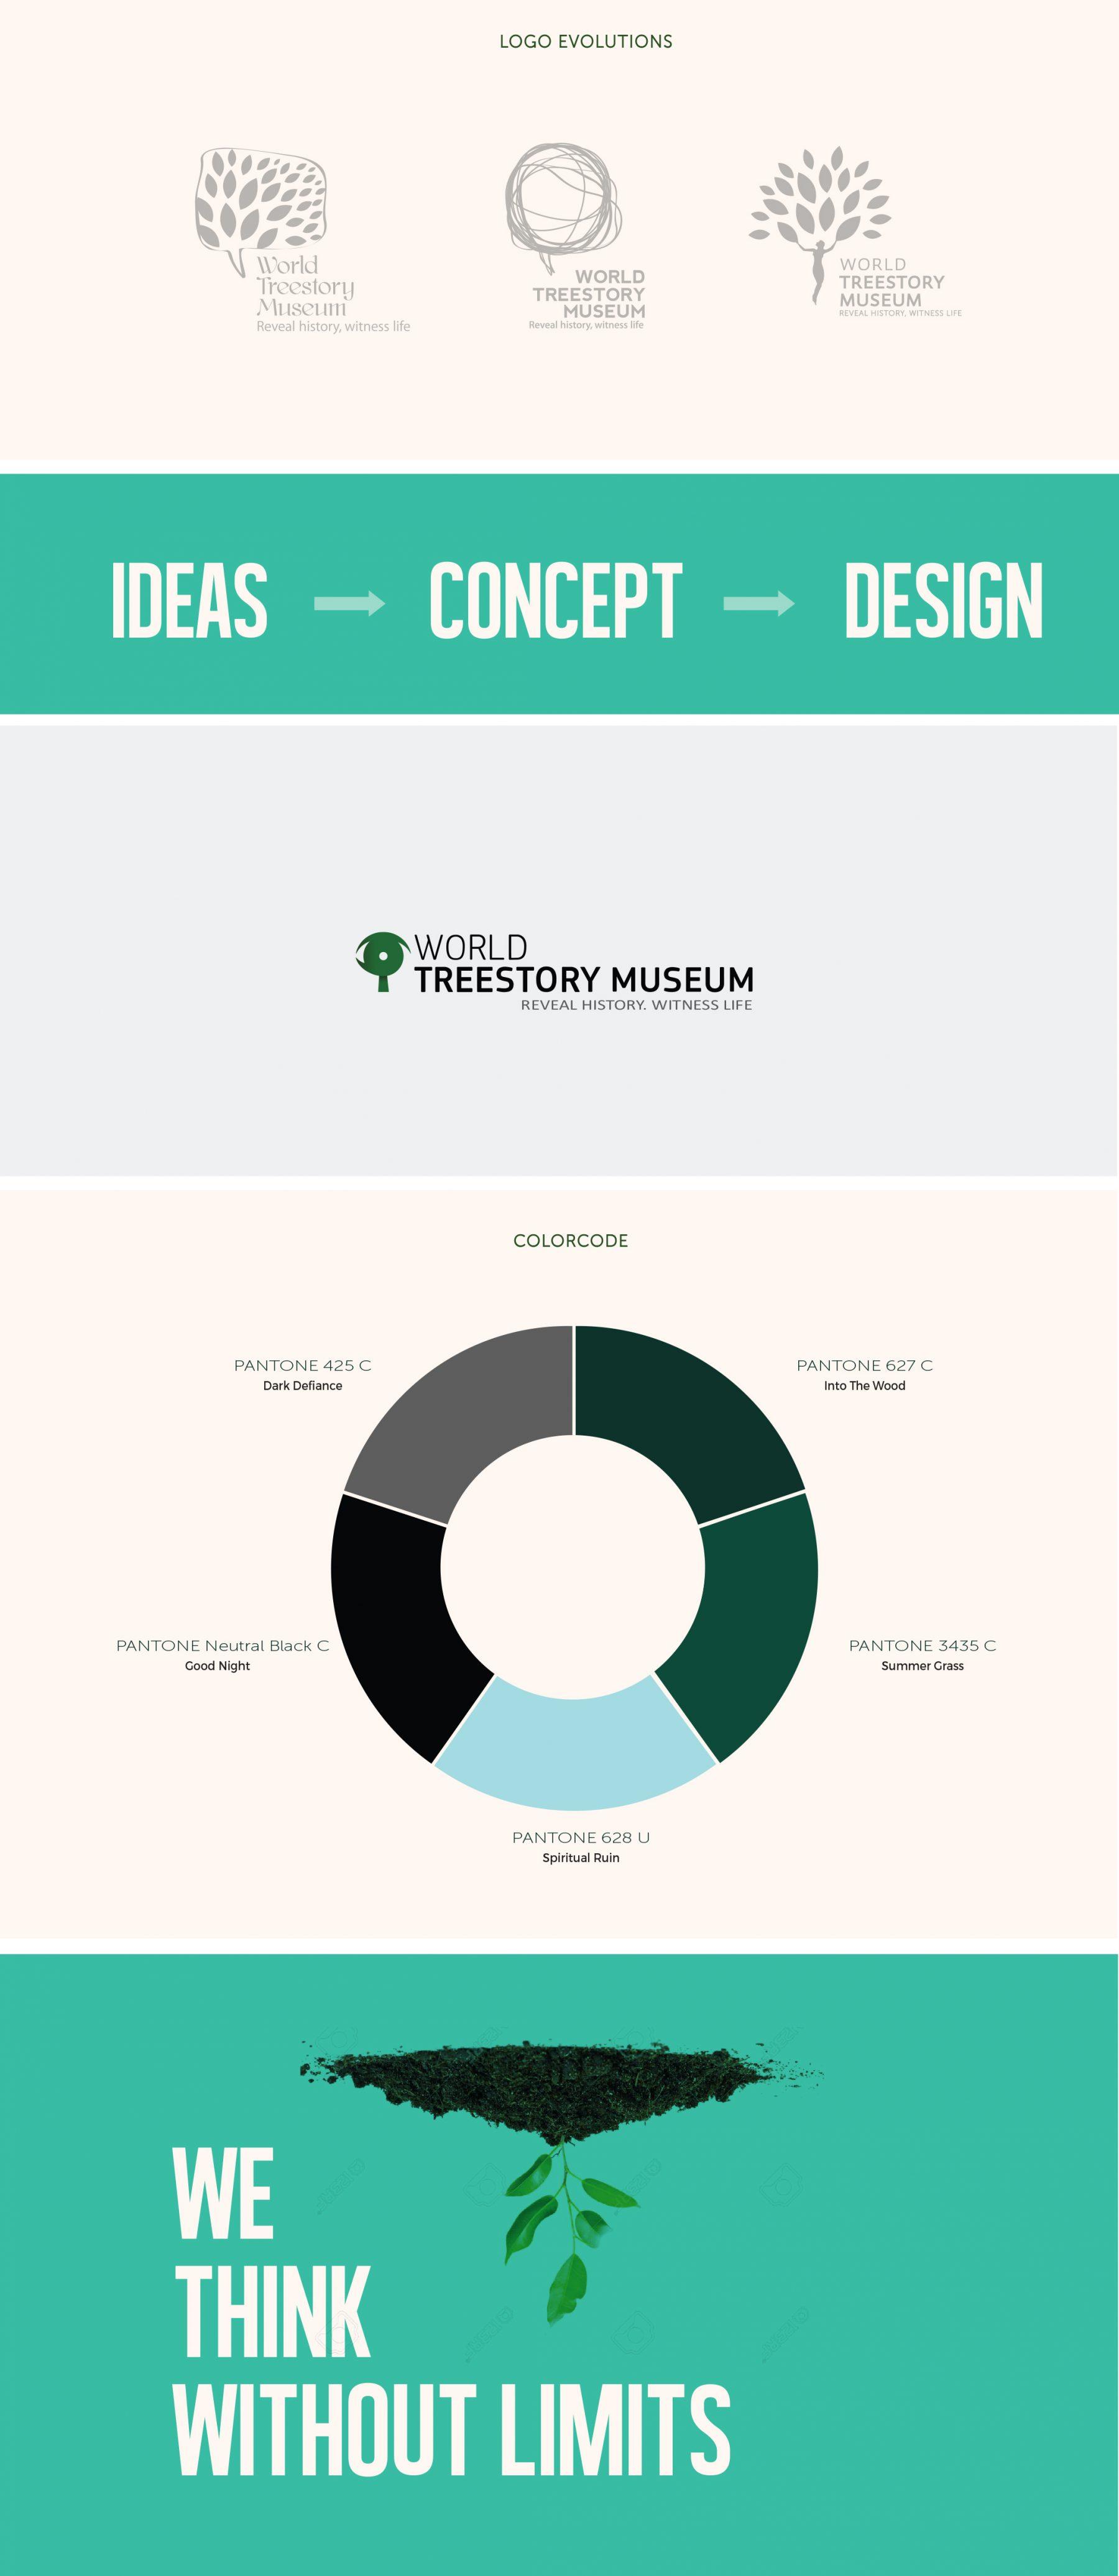 nature, competion, World Treestory Museum, british, competition, branding, broHouse, BroHouse